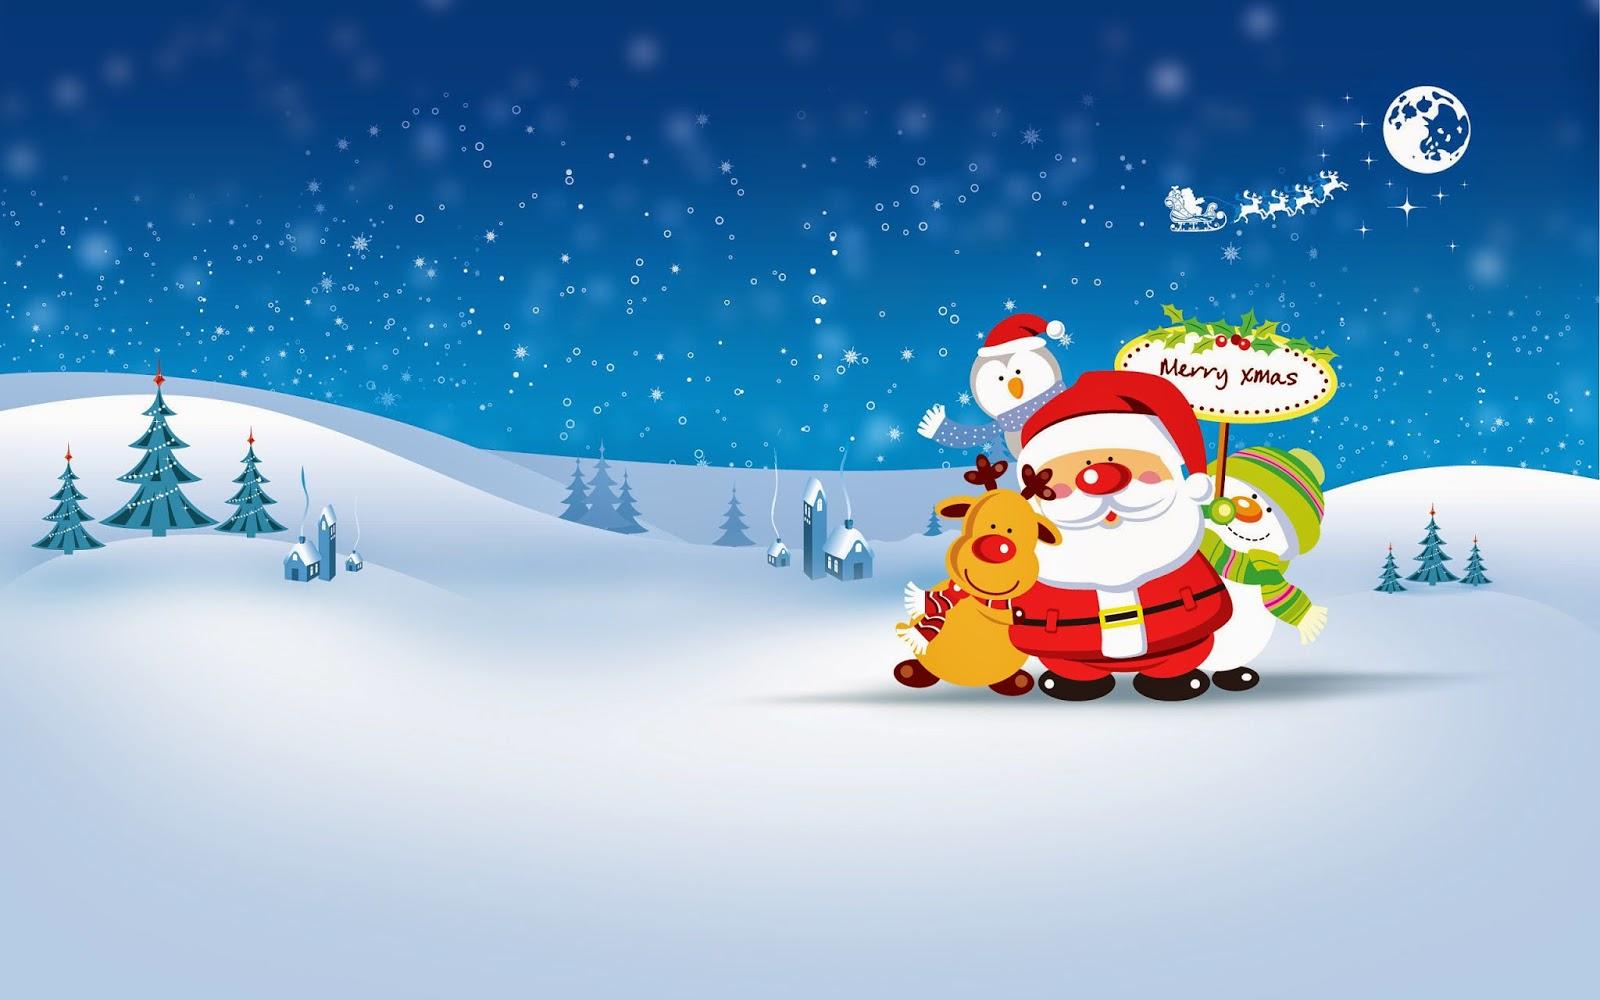 Cute Merry Christmas Wallpaper